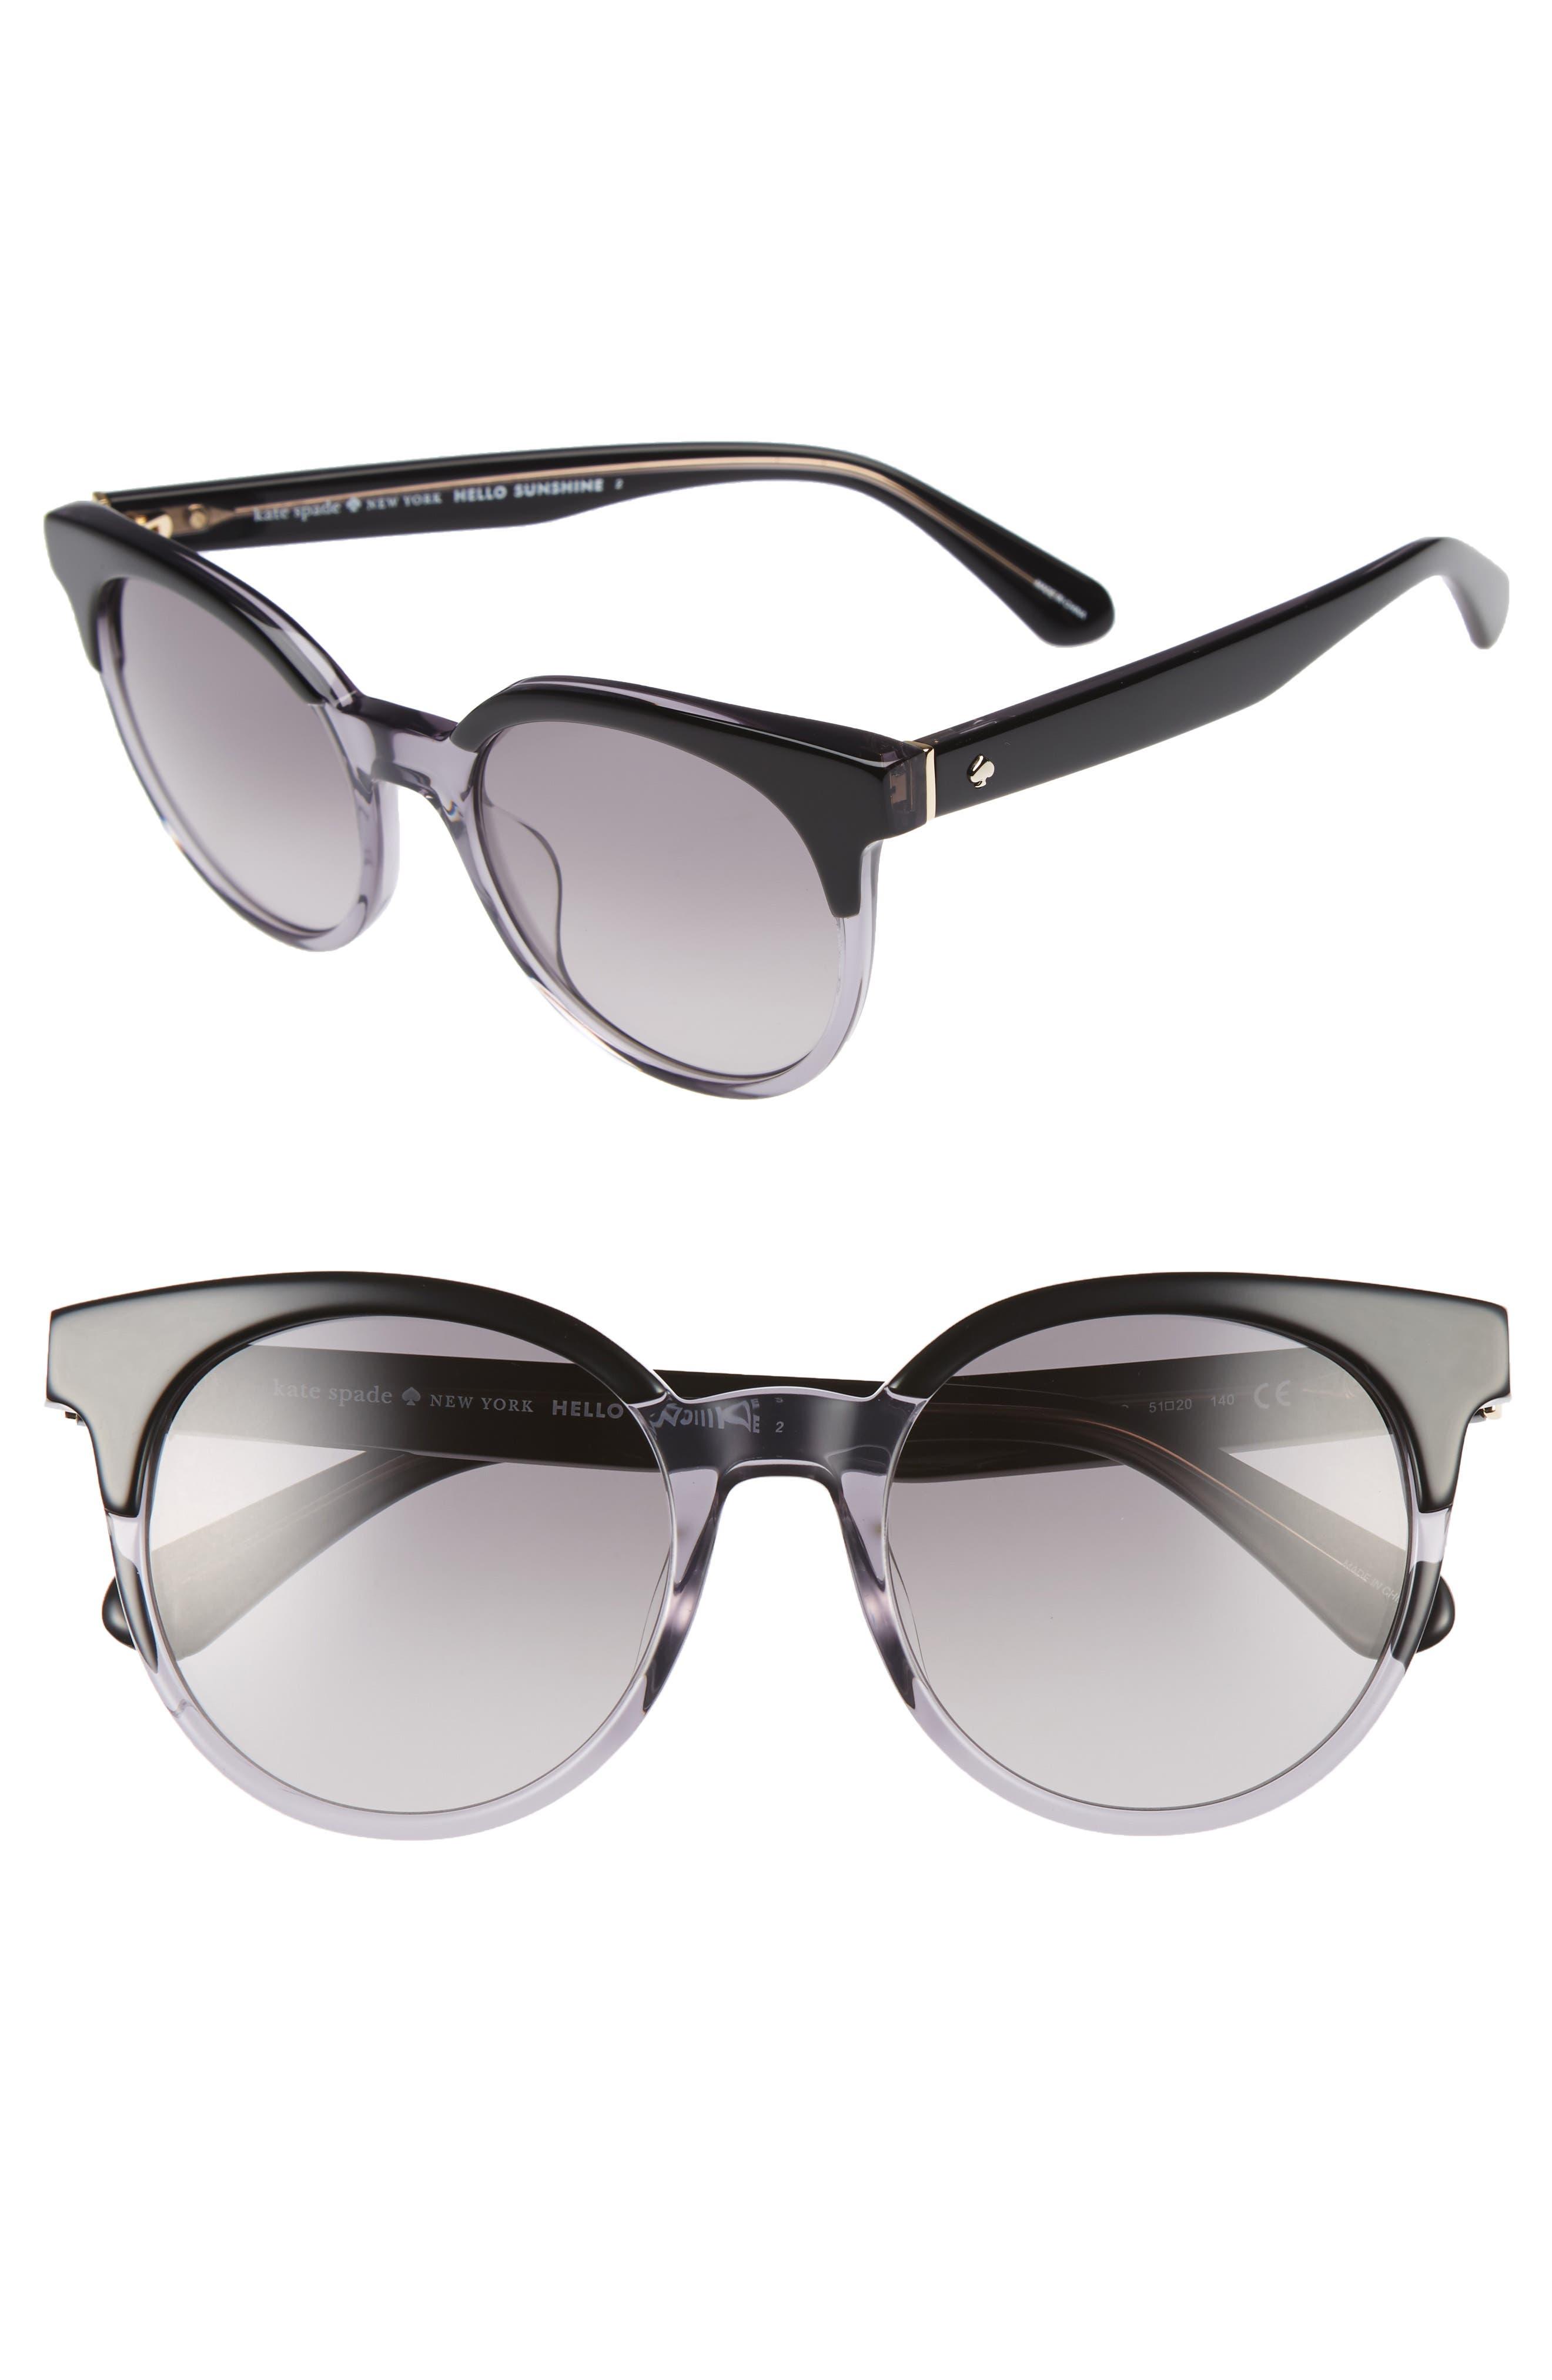 abianne 51mm round sunglasses,                         Main,                         color, Black/ Grey